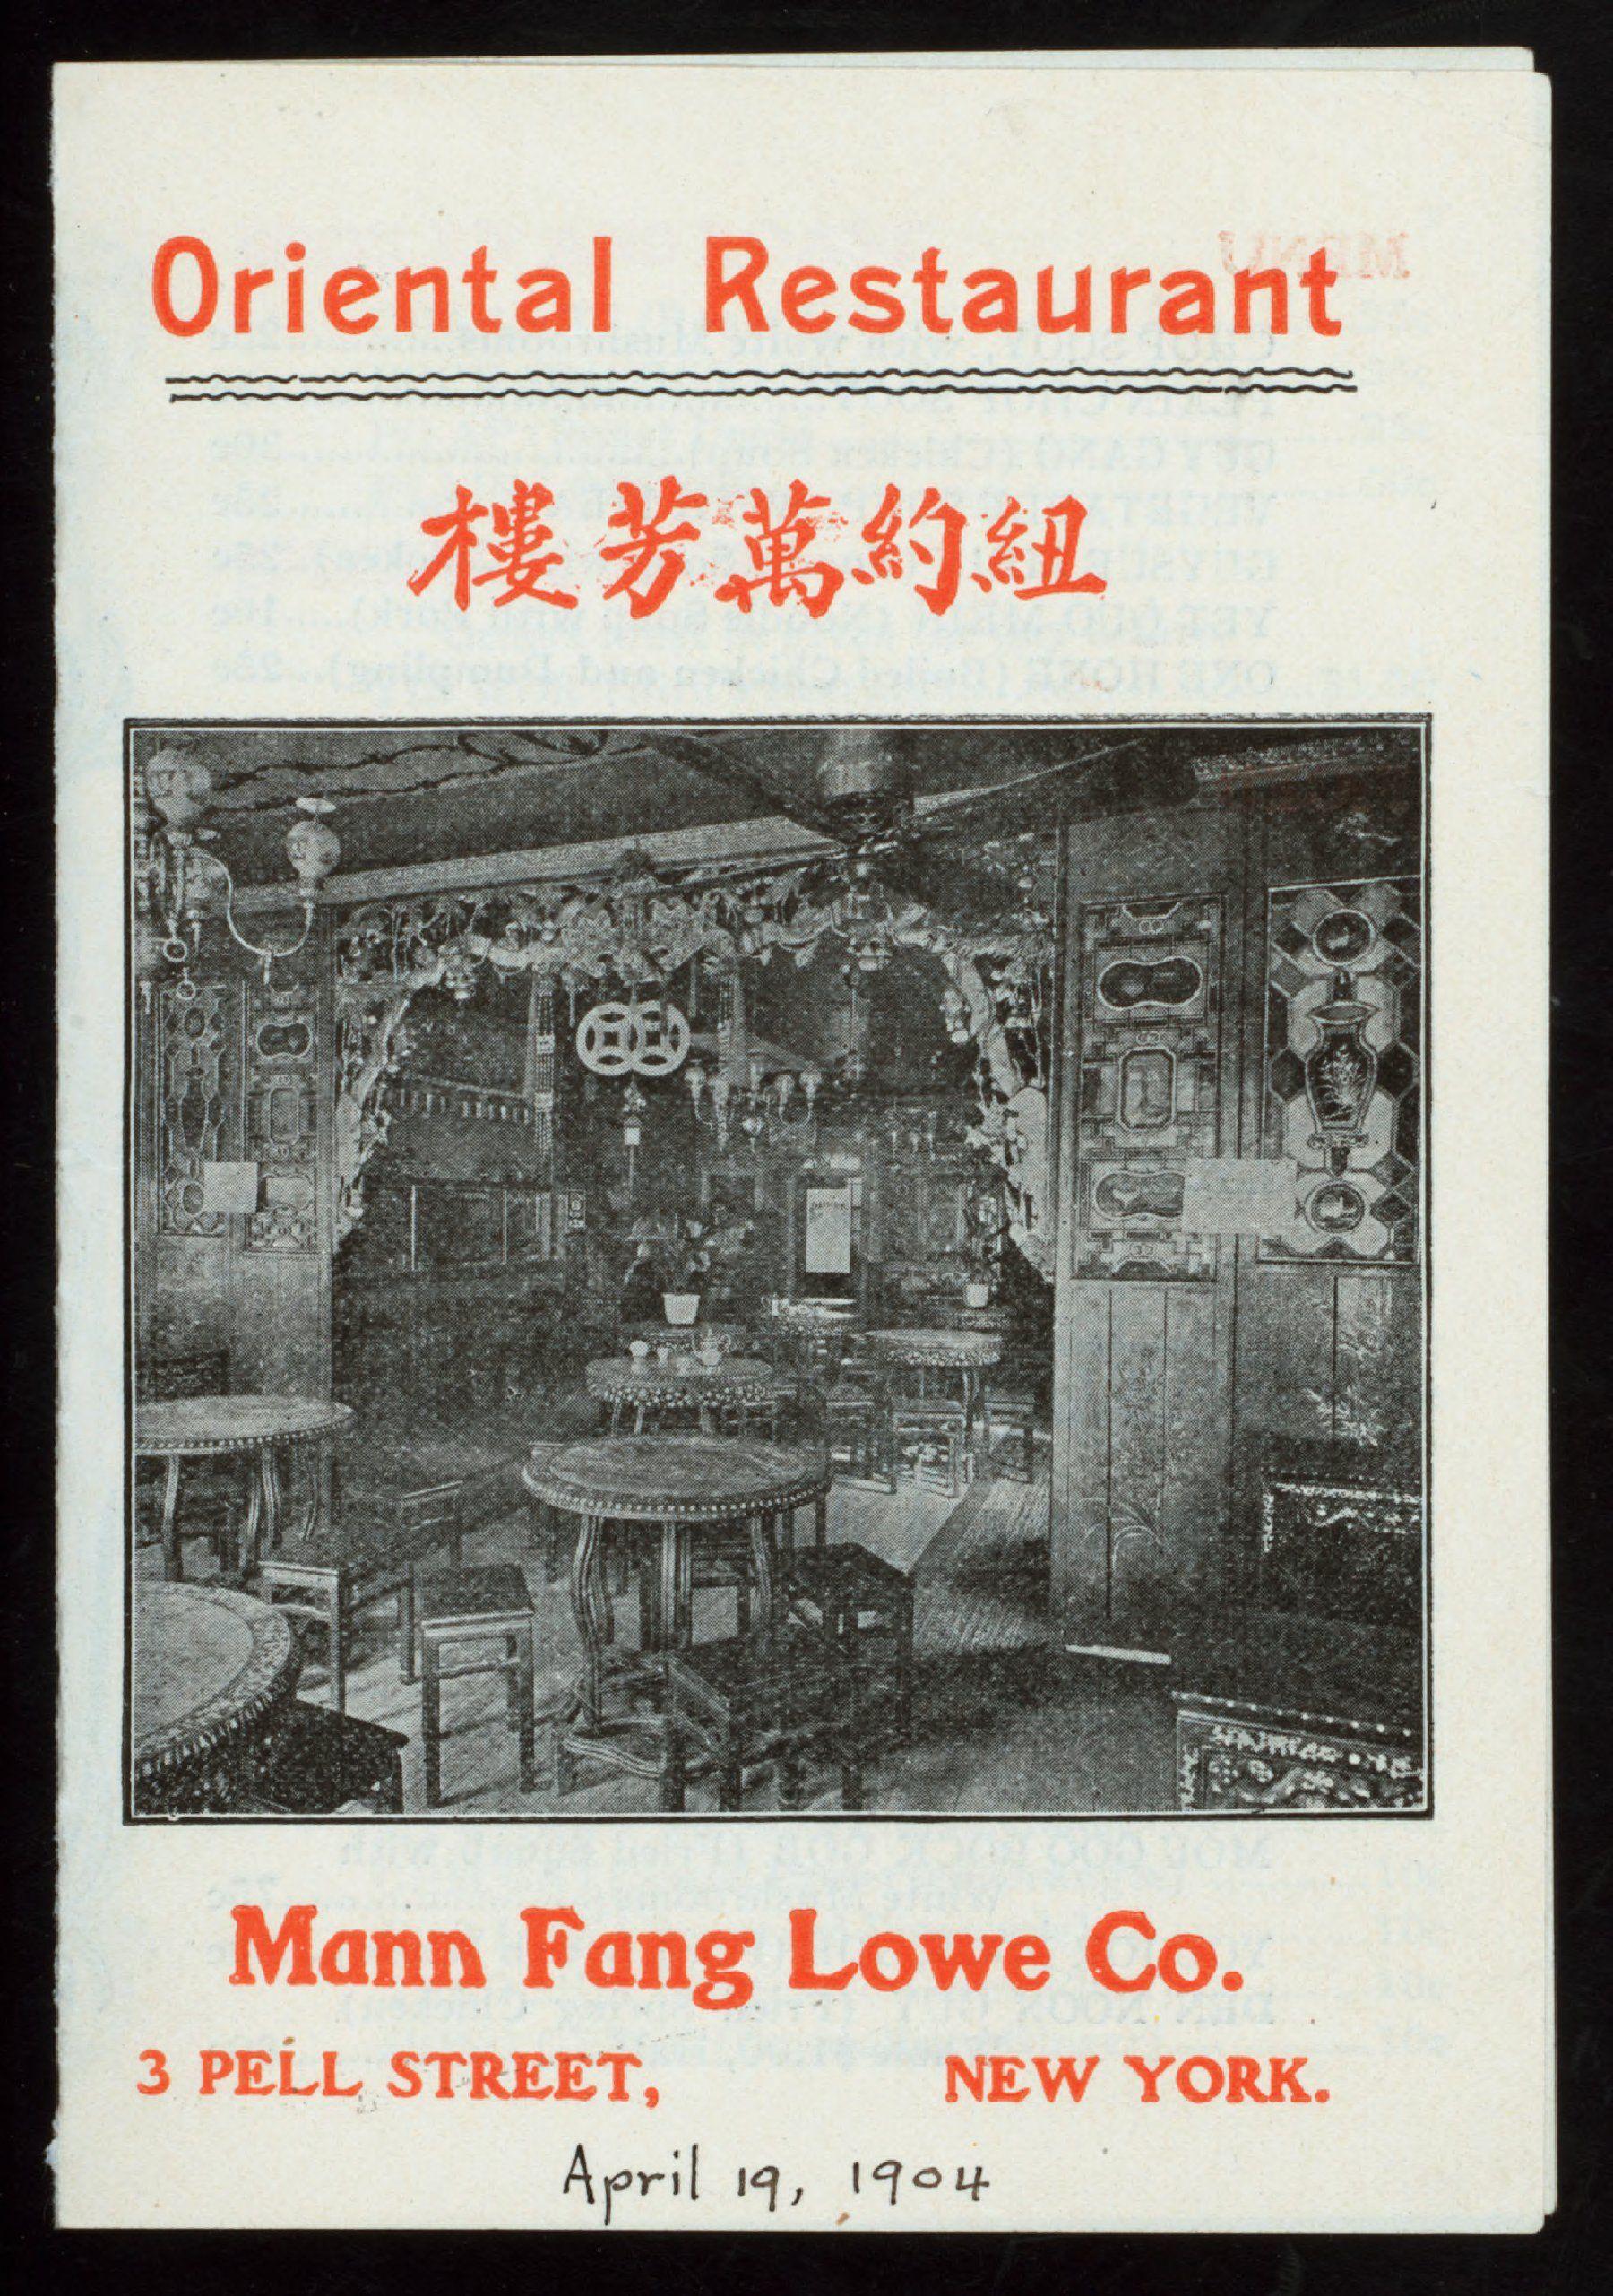 Mann Fang Lowe Co Menus Whats On The Menu Chinese Food Menu Chinese Restaurant Chinese Food